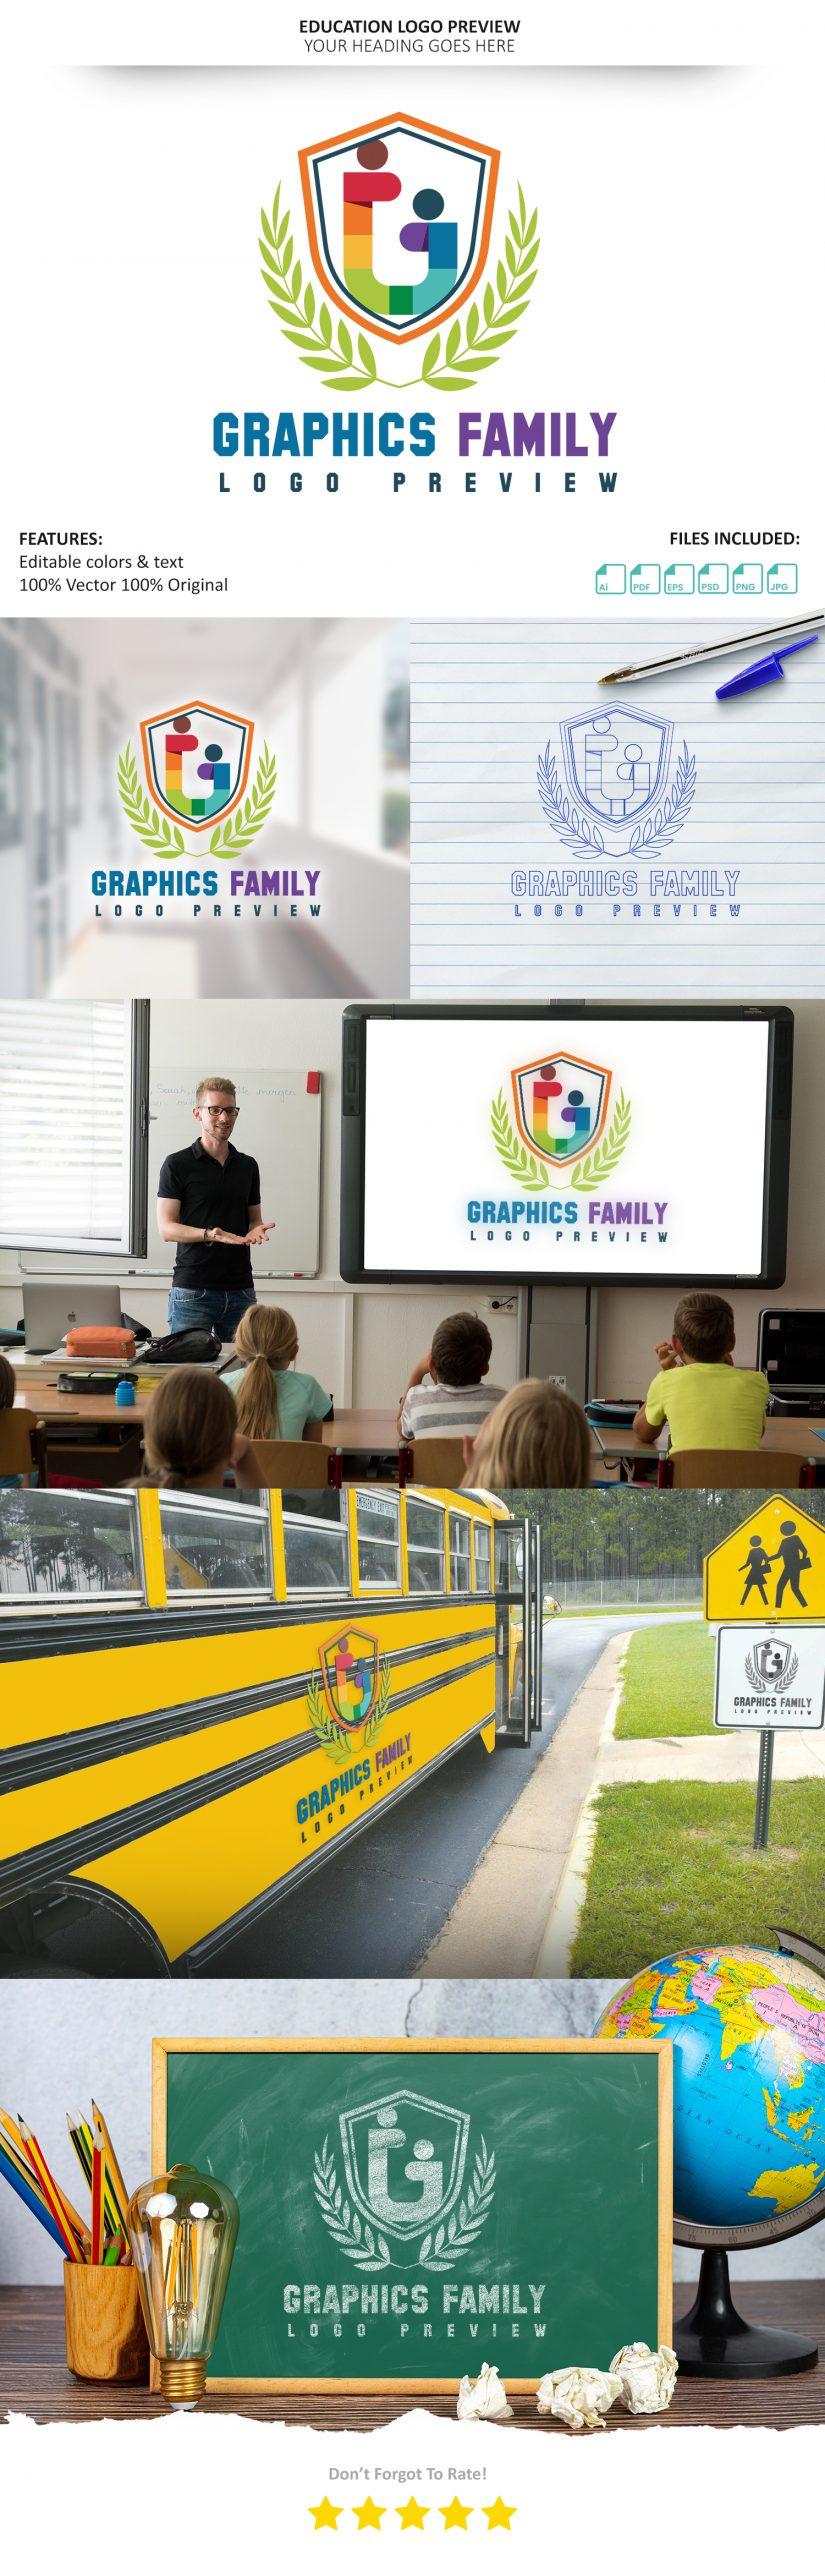 Free-Education-Logo-Presentation-Mockup Download